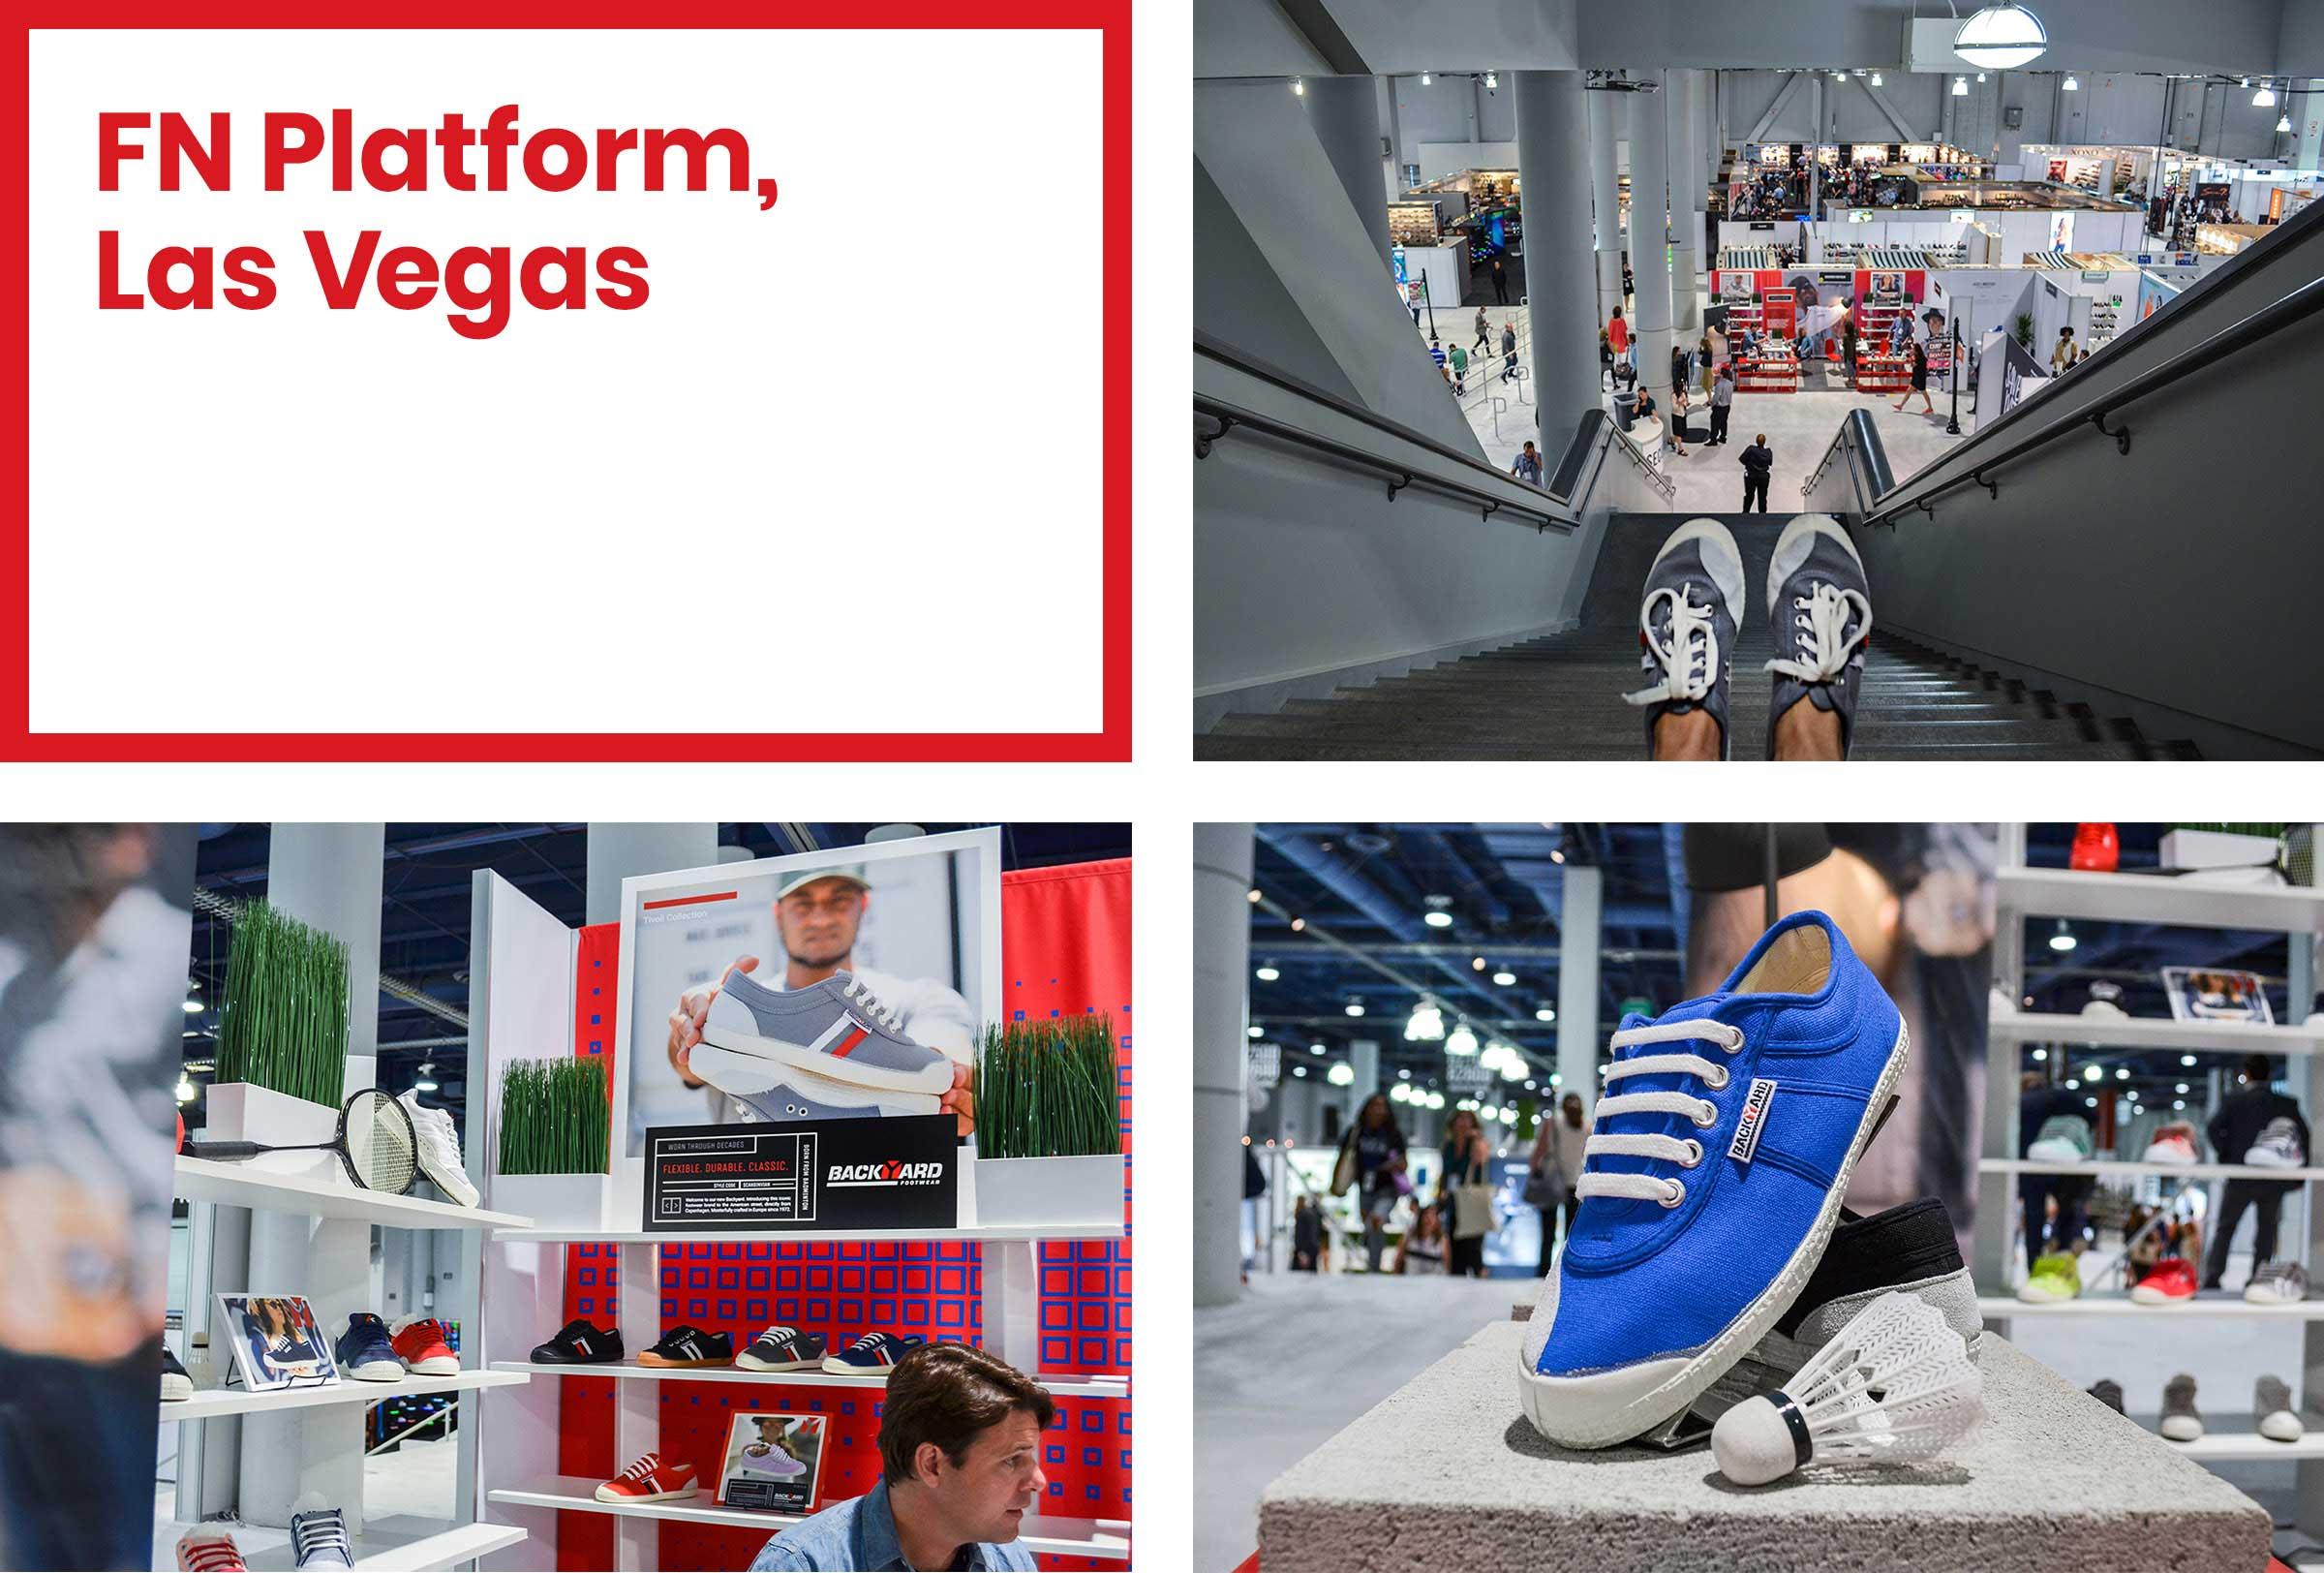 Backyard Footwear FN Platform Las Vegas Exhibit Award